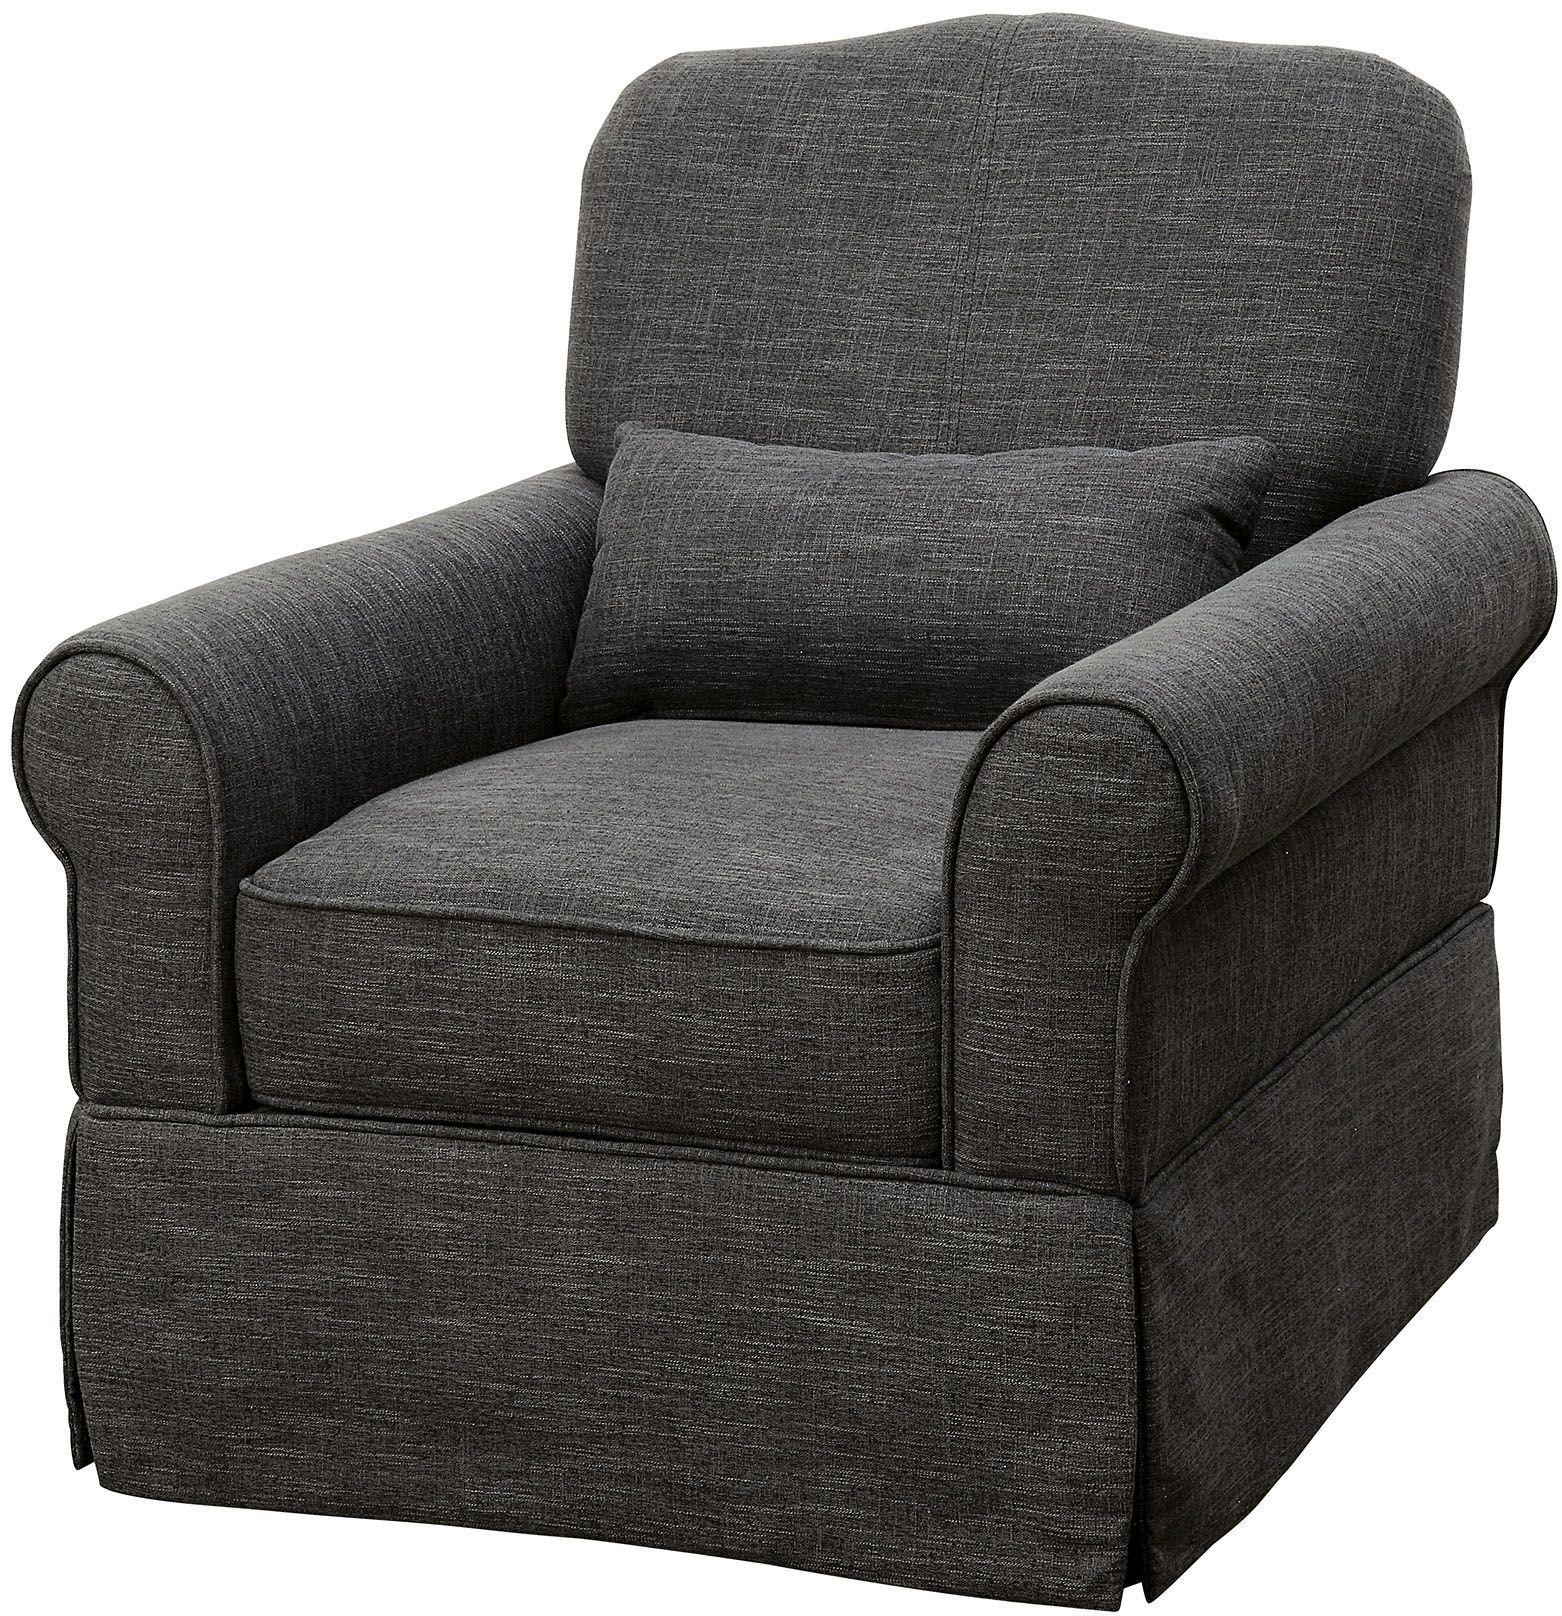 Lesly Dark Gray 360 Swivel Glider Reclining Chair from